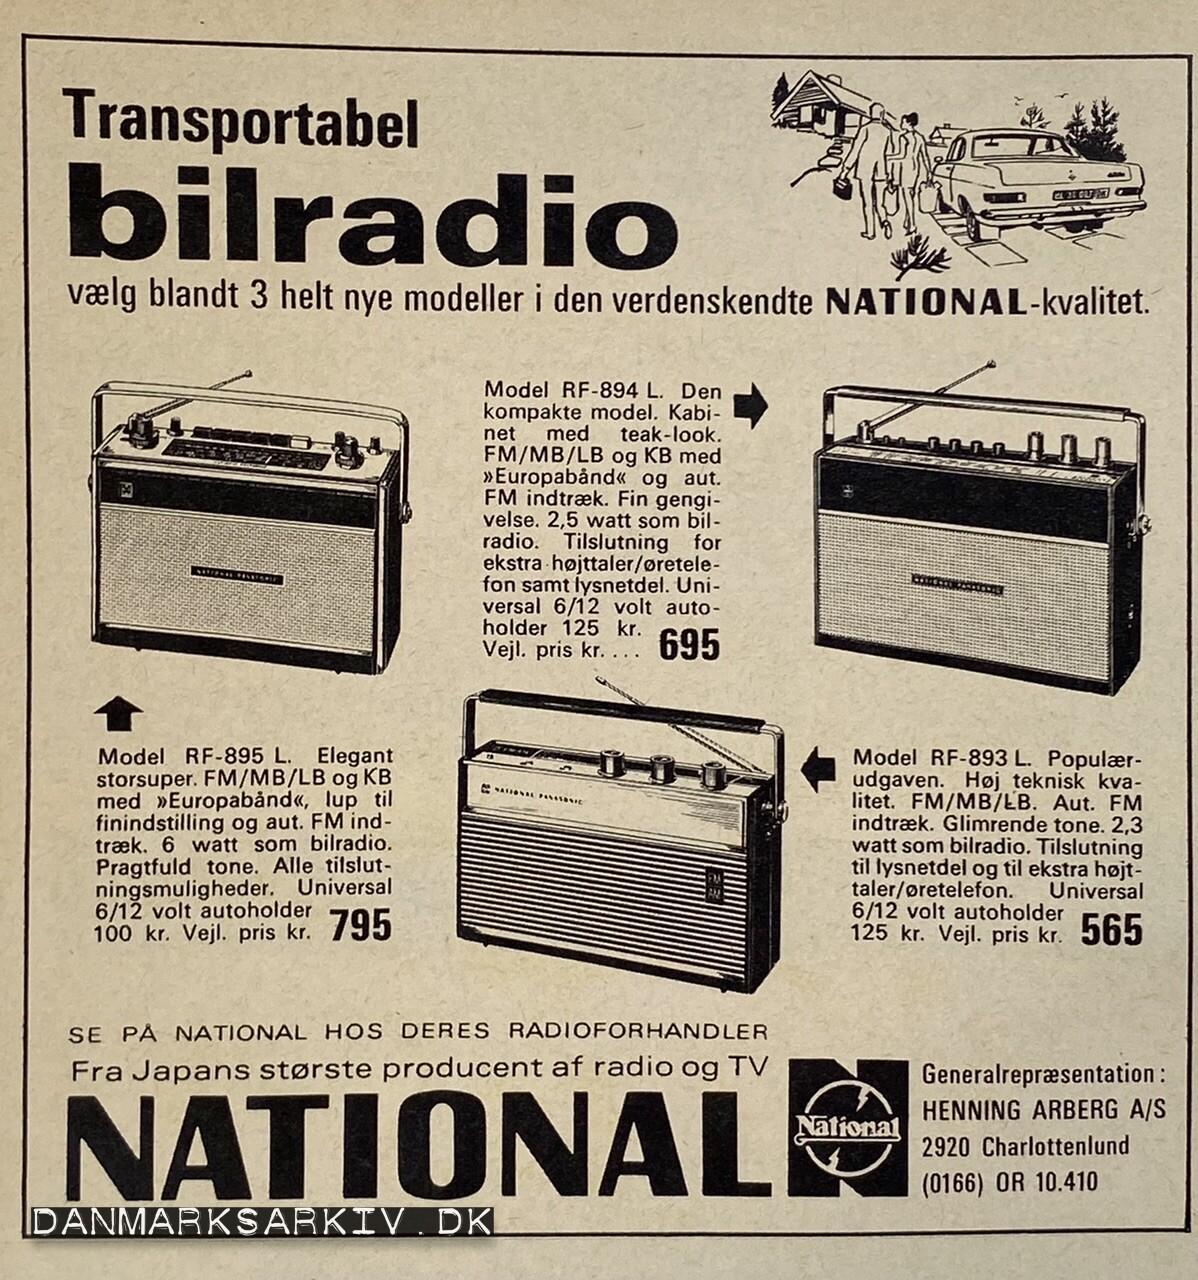 National - Transportabel bilradio - Henning Arberg